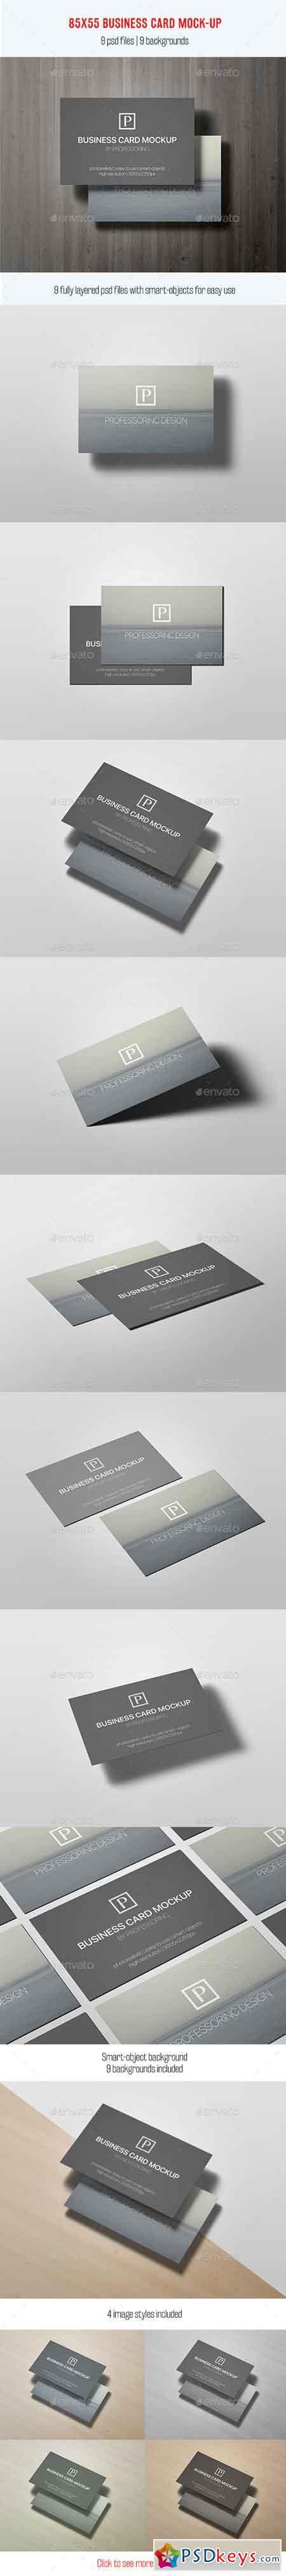 85x55 Business Card Mock-Up Vol. 2 12578507